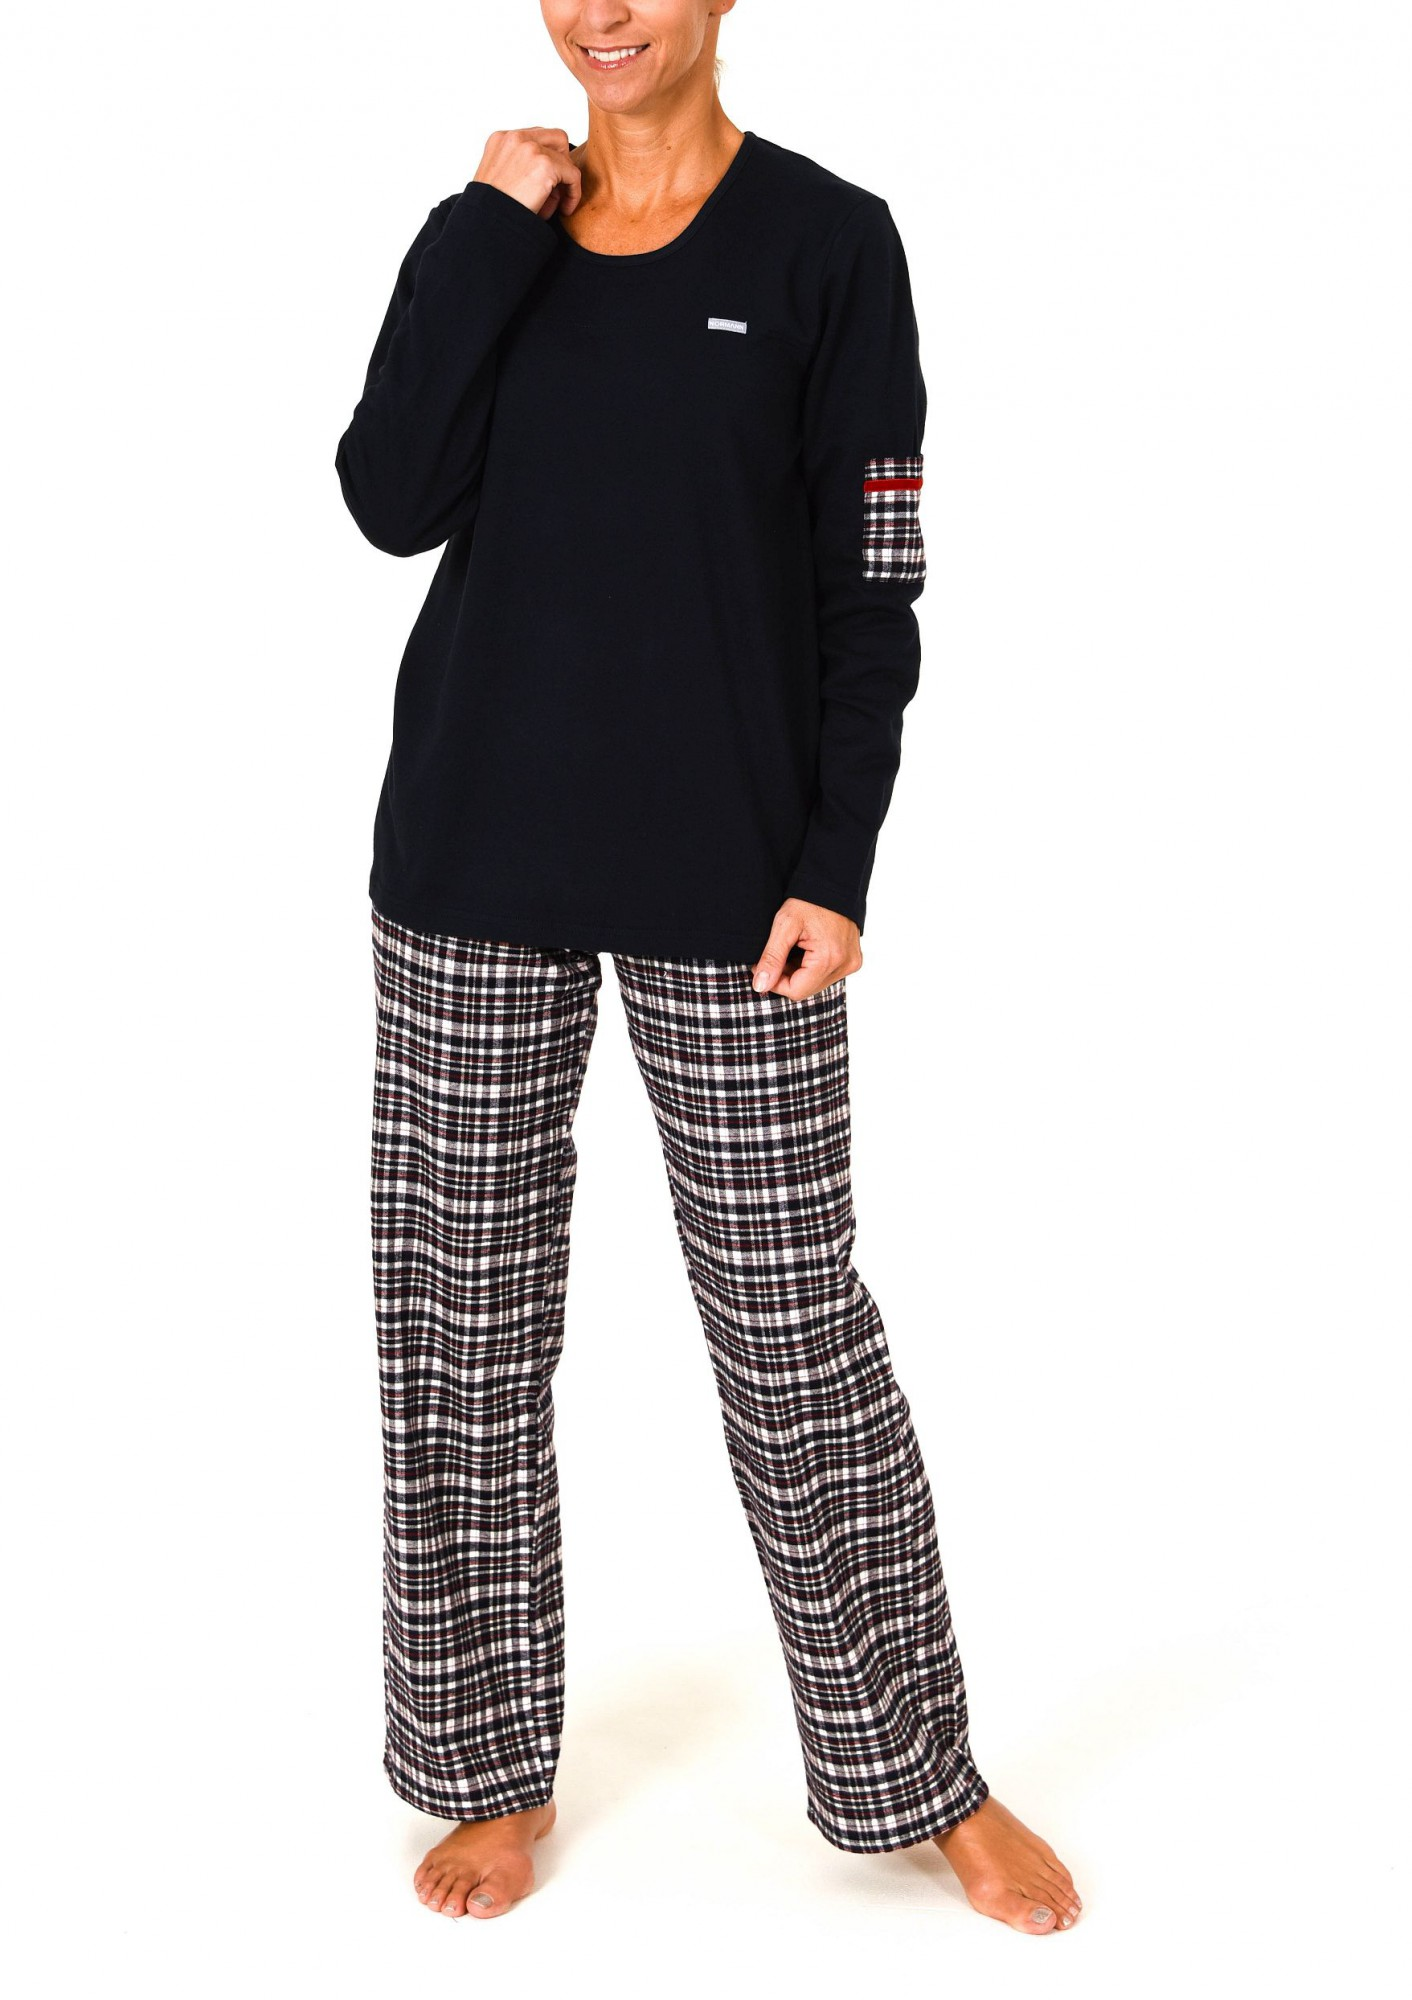 damen flanell pyjama mix match hose flanell oberteil interlock auch in bergr ssen. Black Bedroom Furniture Sets. Home Design Ideas